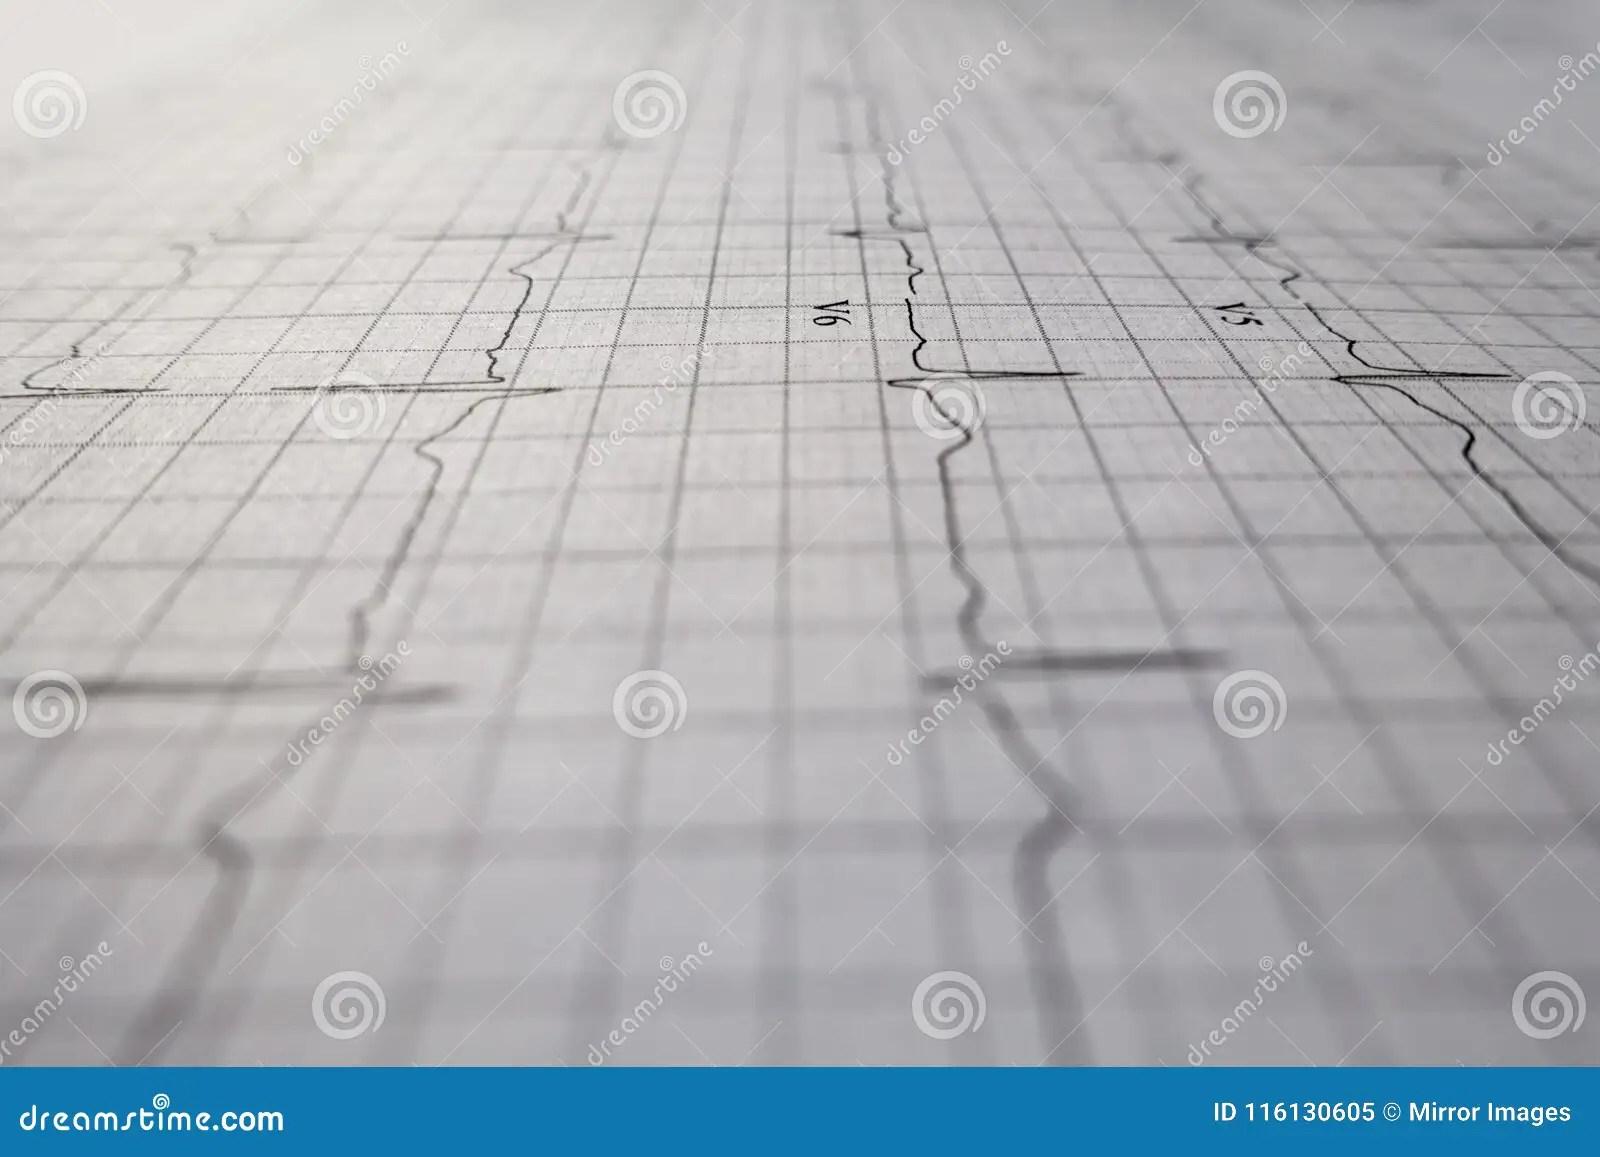 Close Up Ekg Heart Beat Test Stock Image